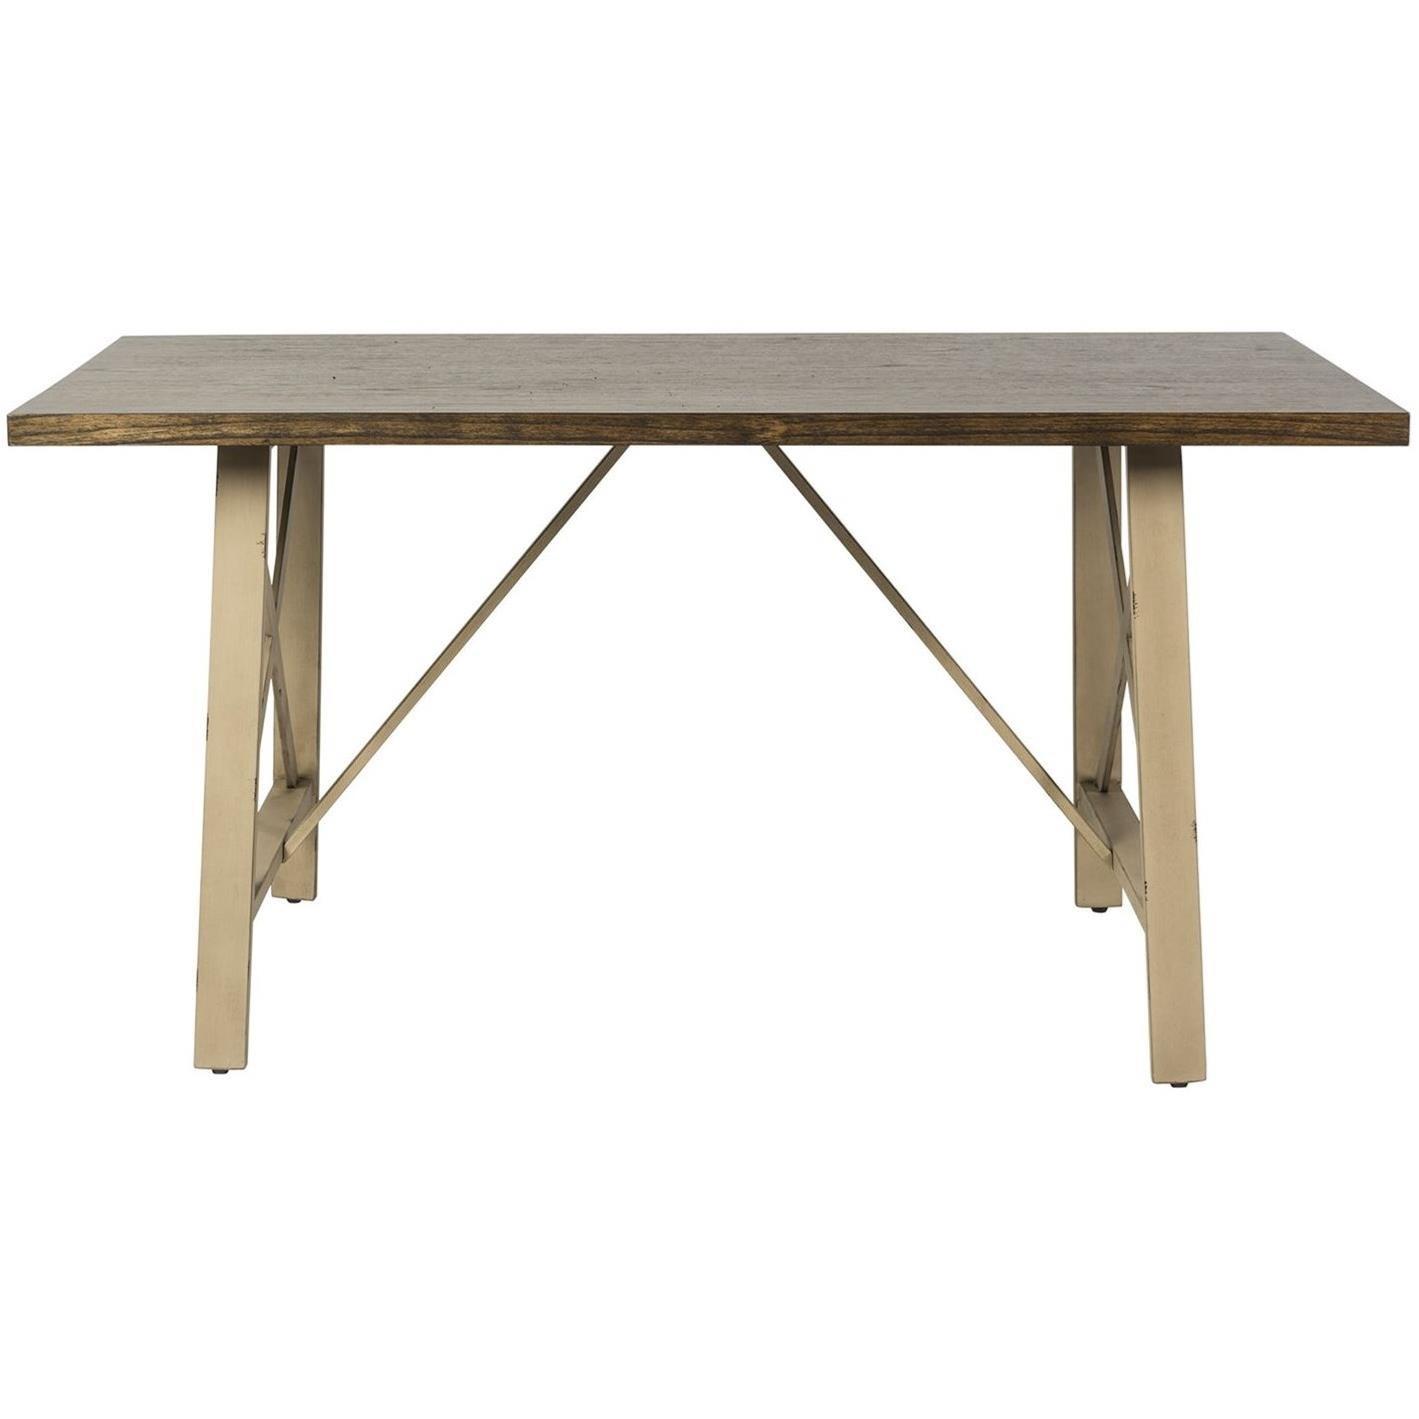 Rectangular Leg Table with X Base End Panels